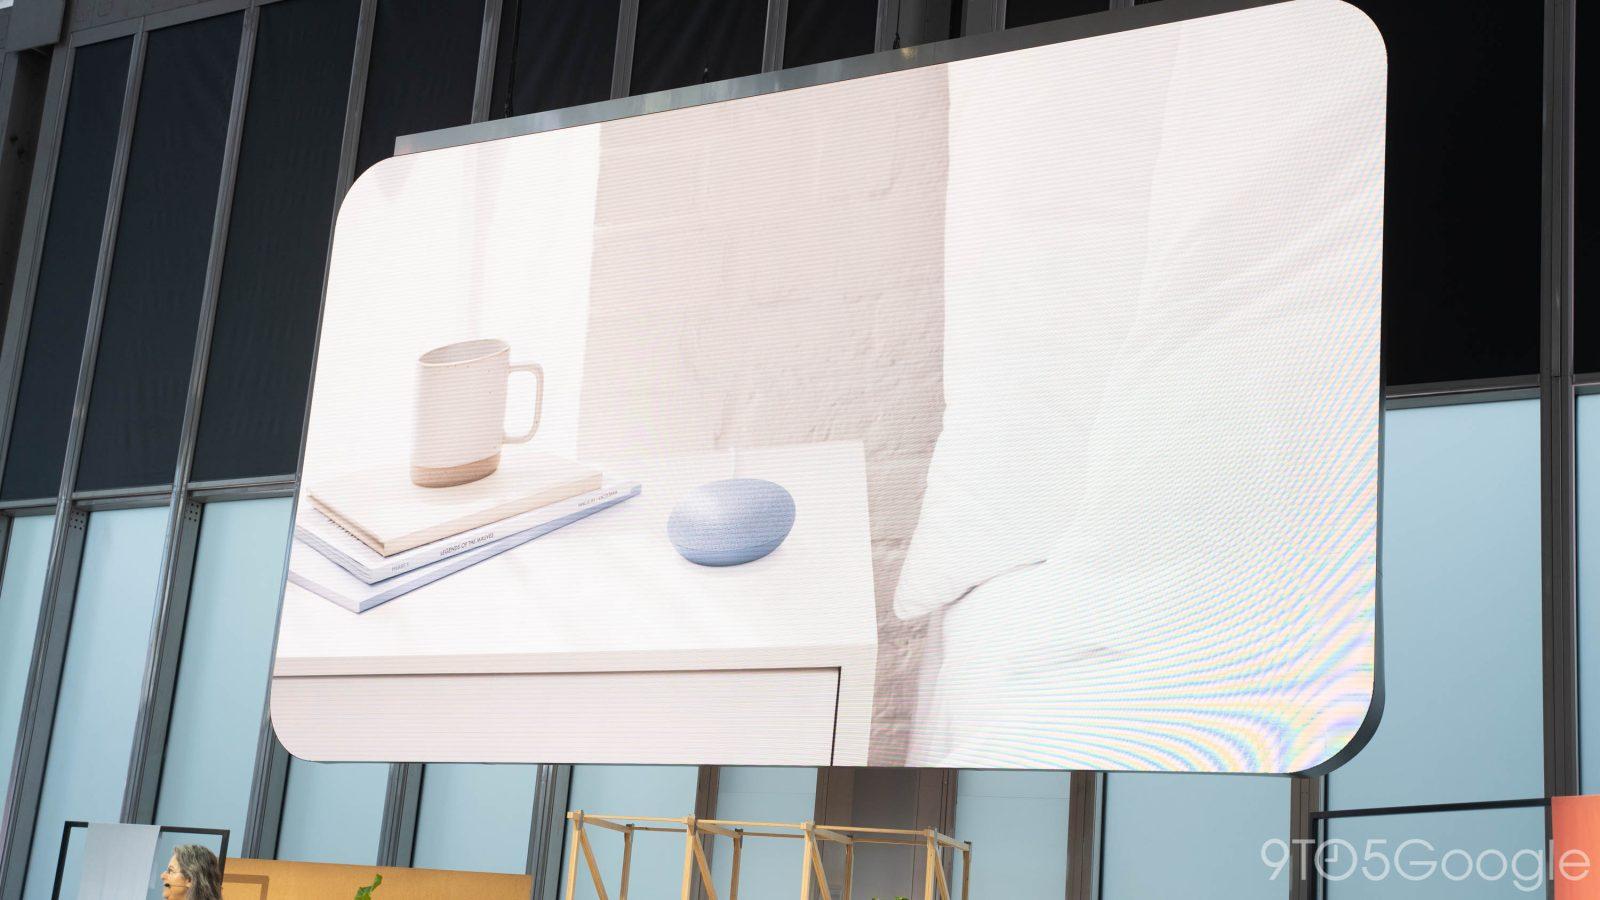 Google announces Nest Mini with better sound & wall mount, still $49